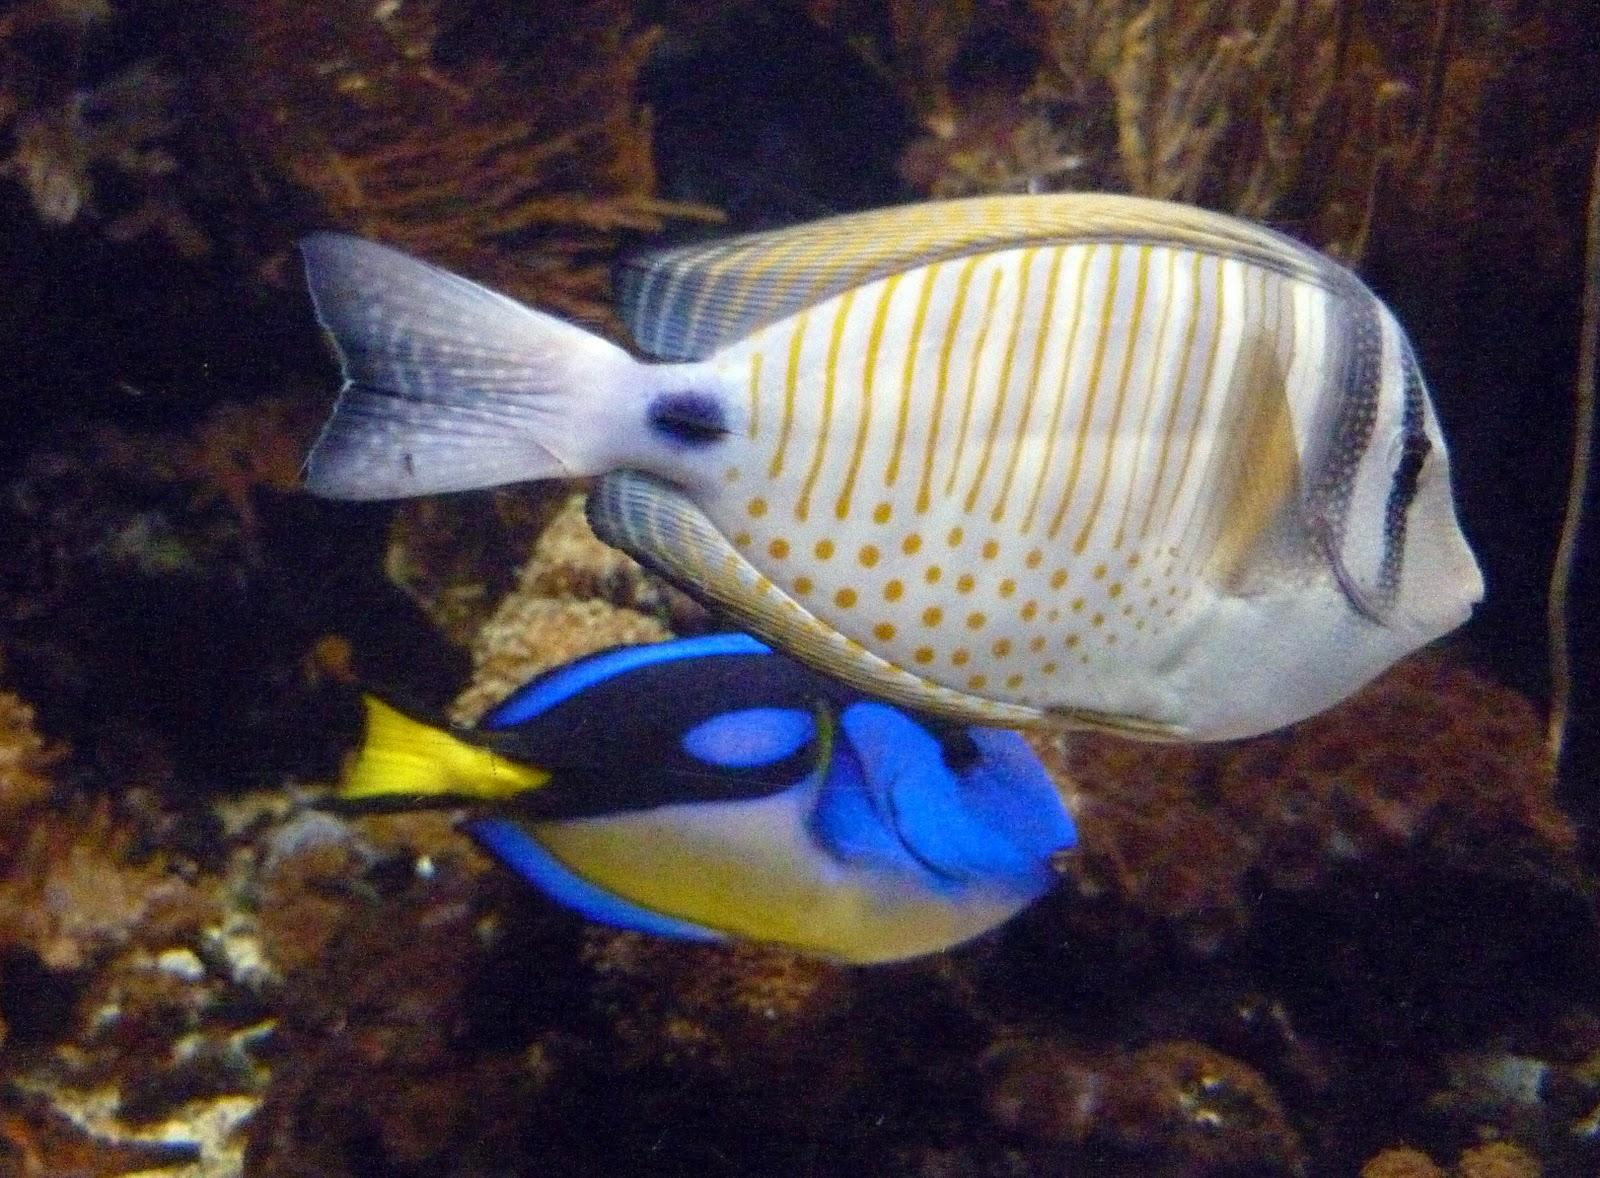 Erin Louise Buckley: London Sea Life Centre